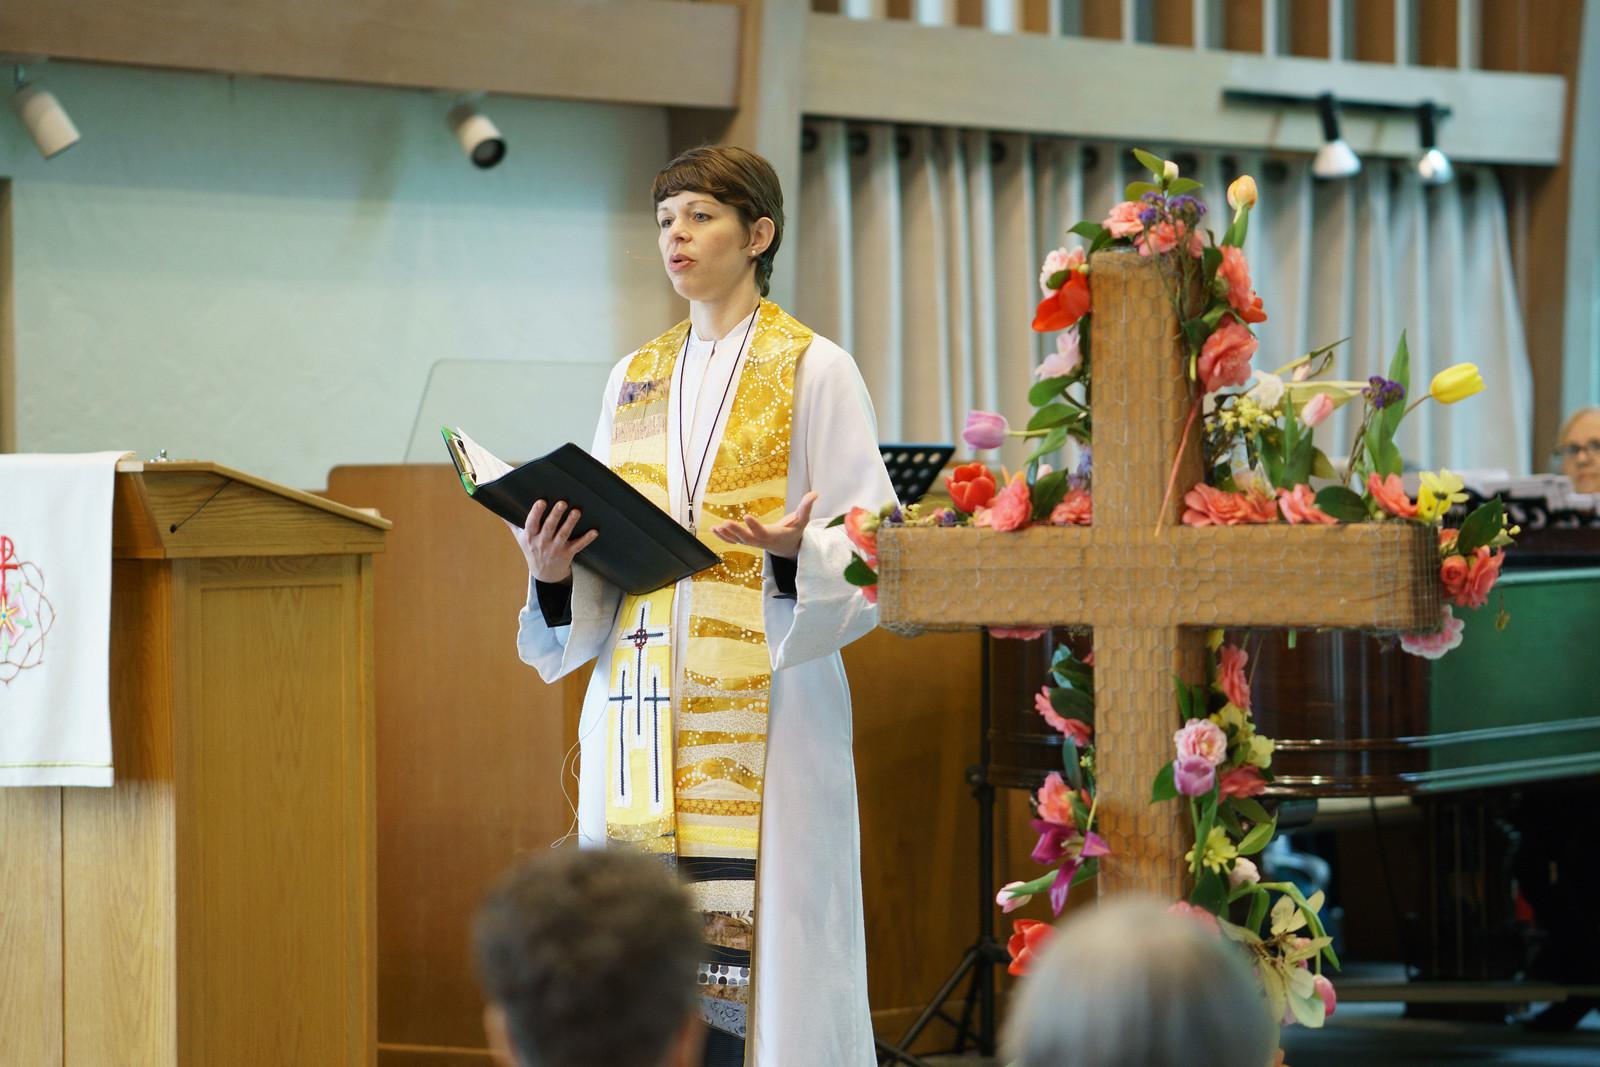 Pastor Leah -